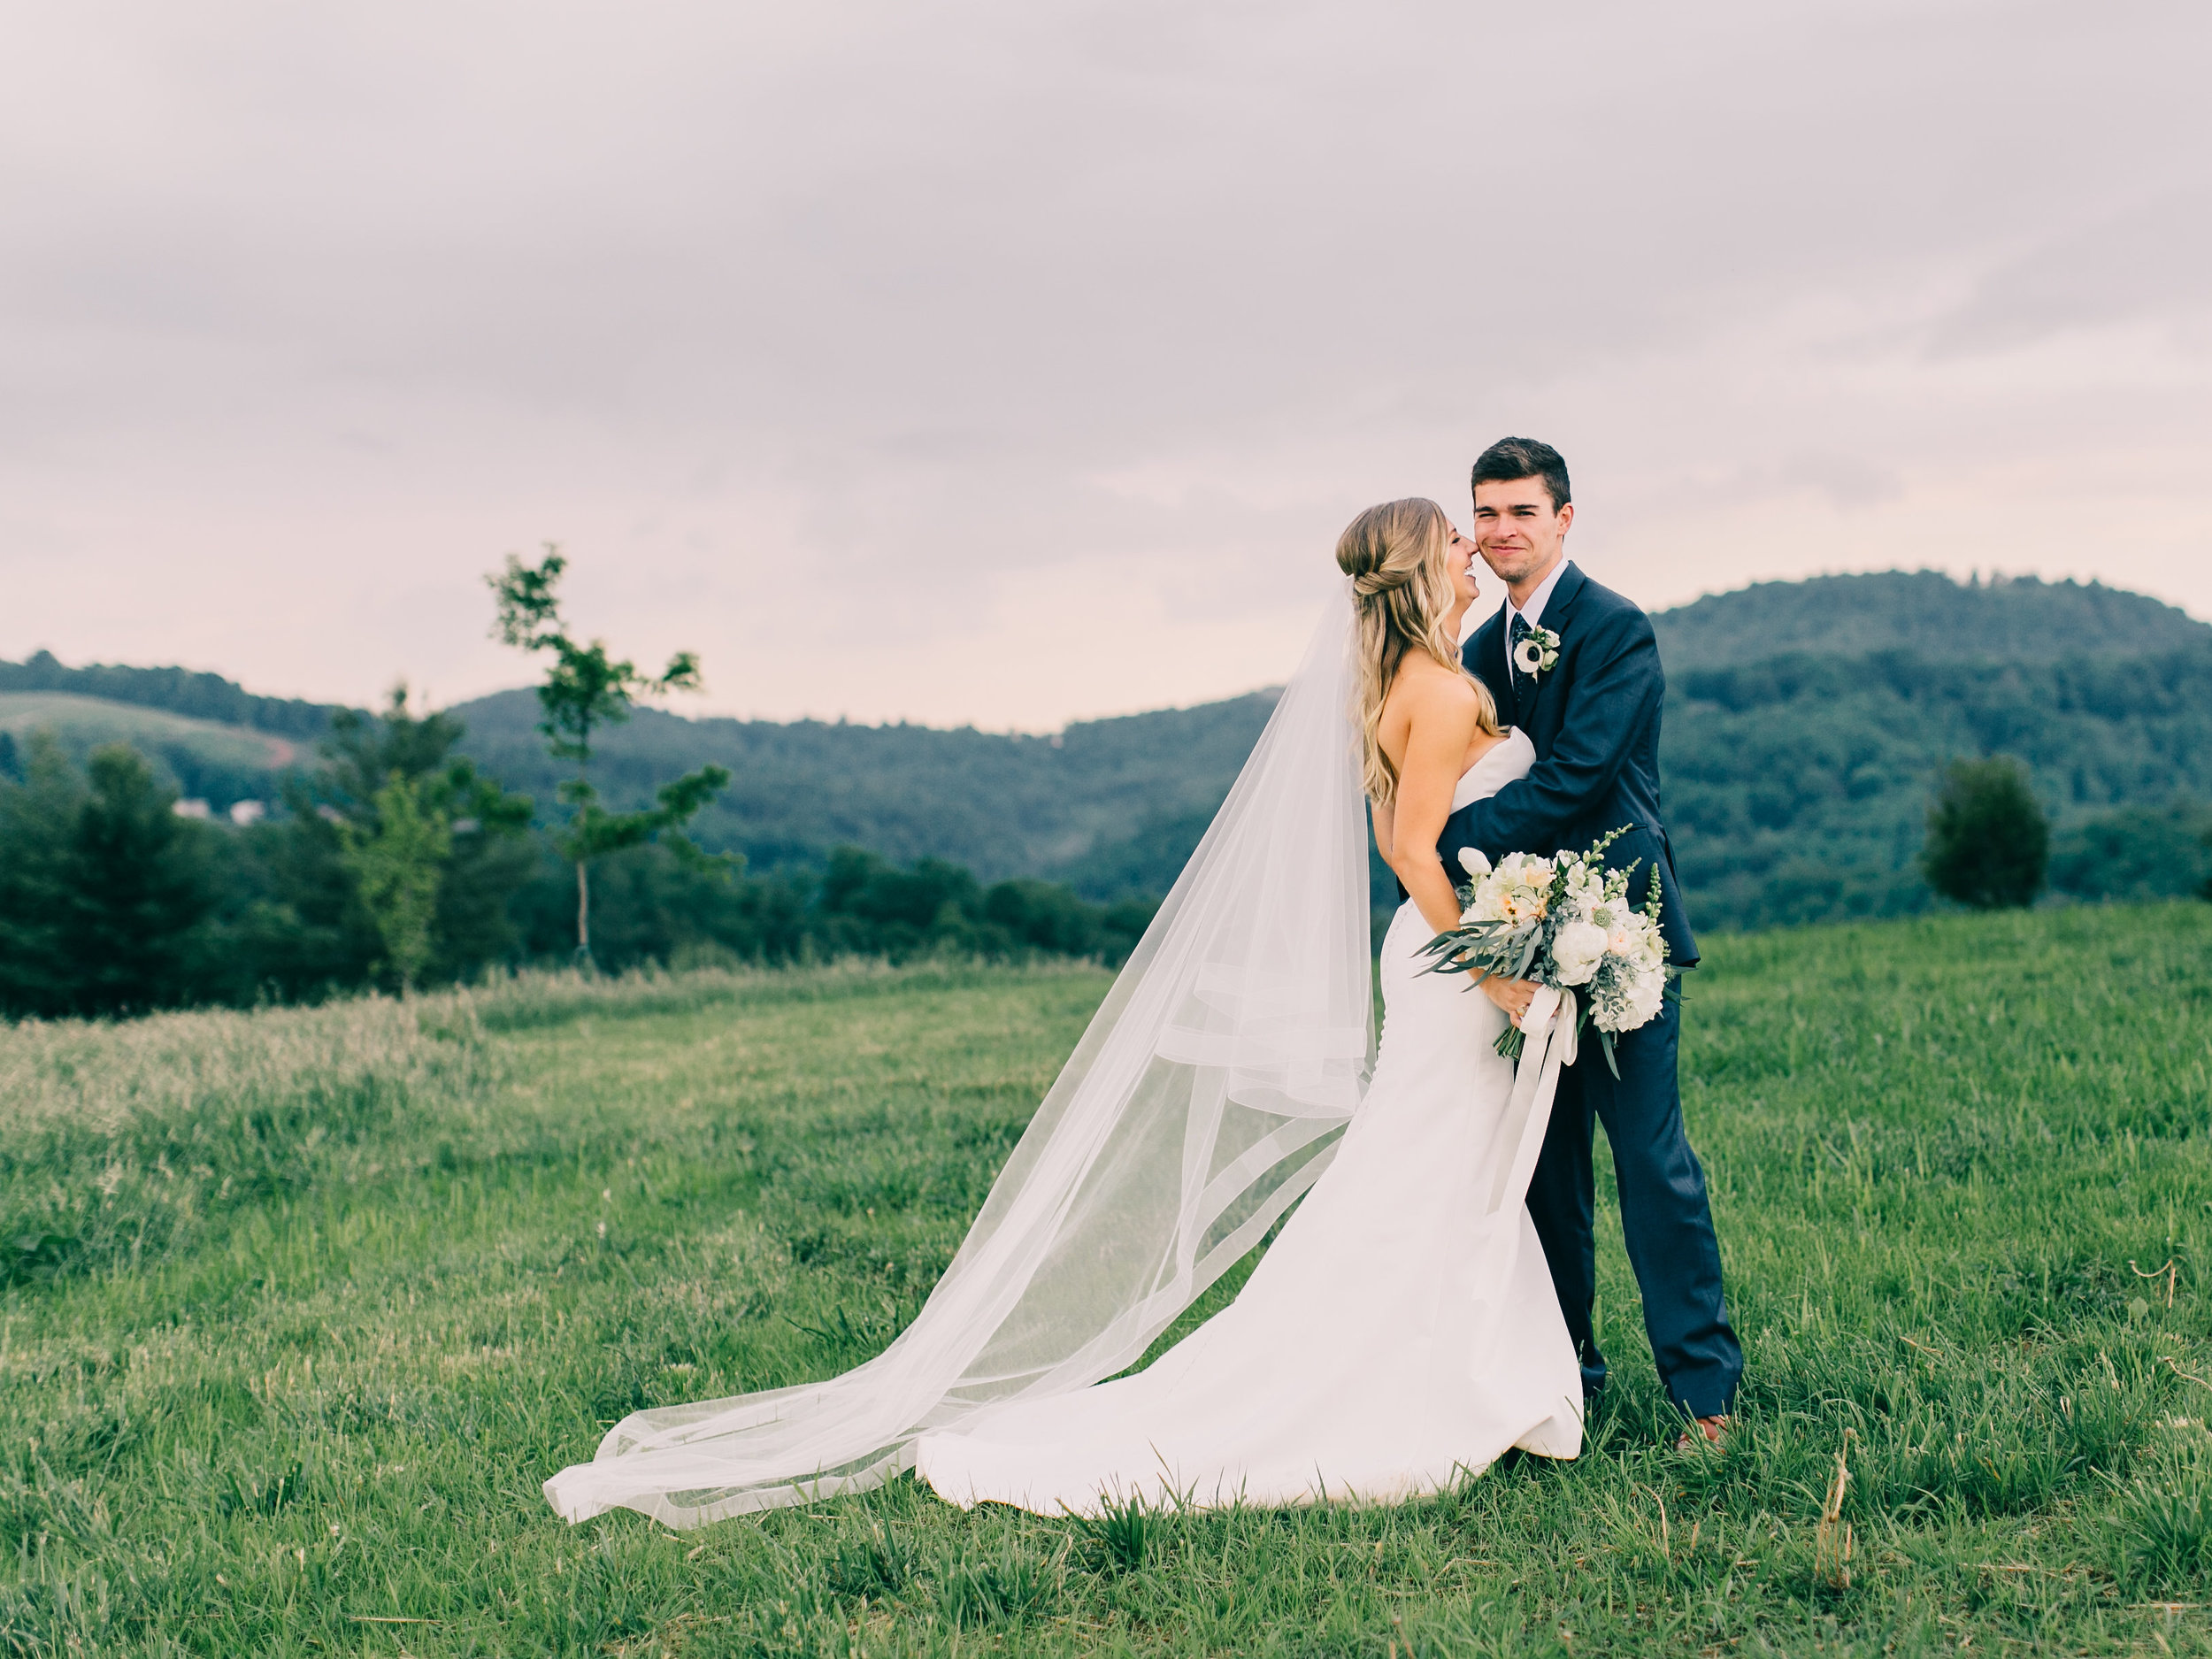 JordanMaunder-LeCroy-BrideGroom-7.jpg